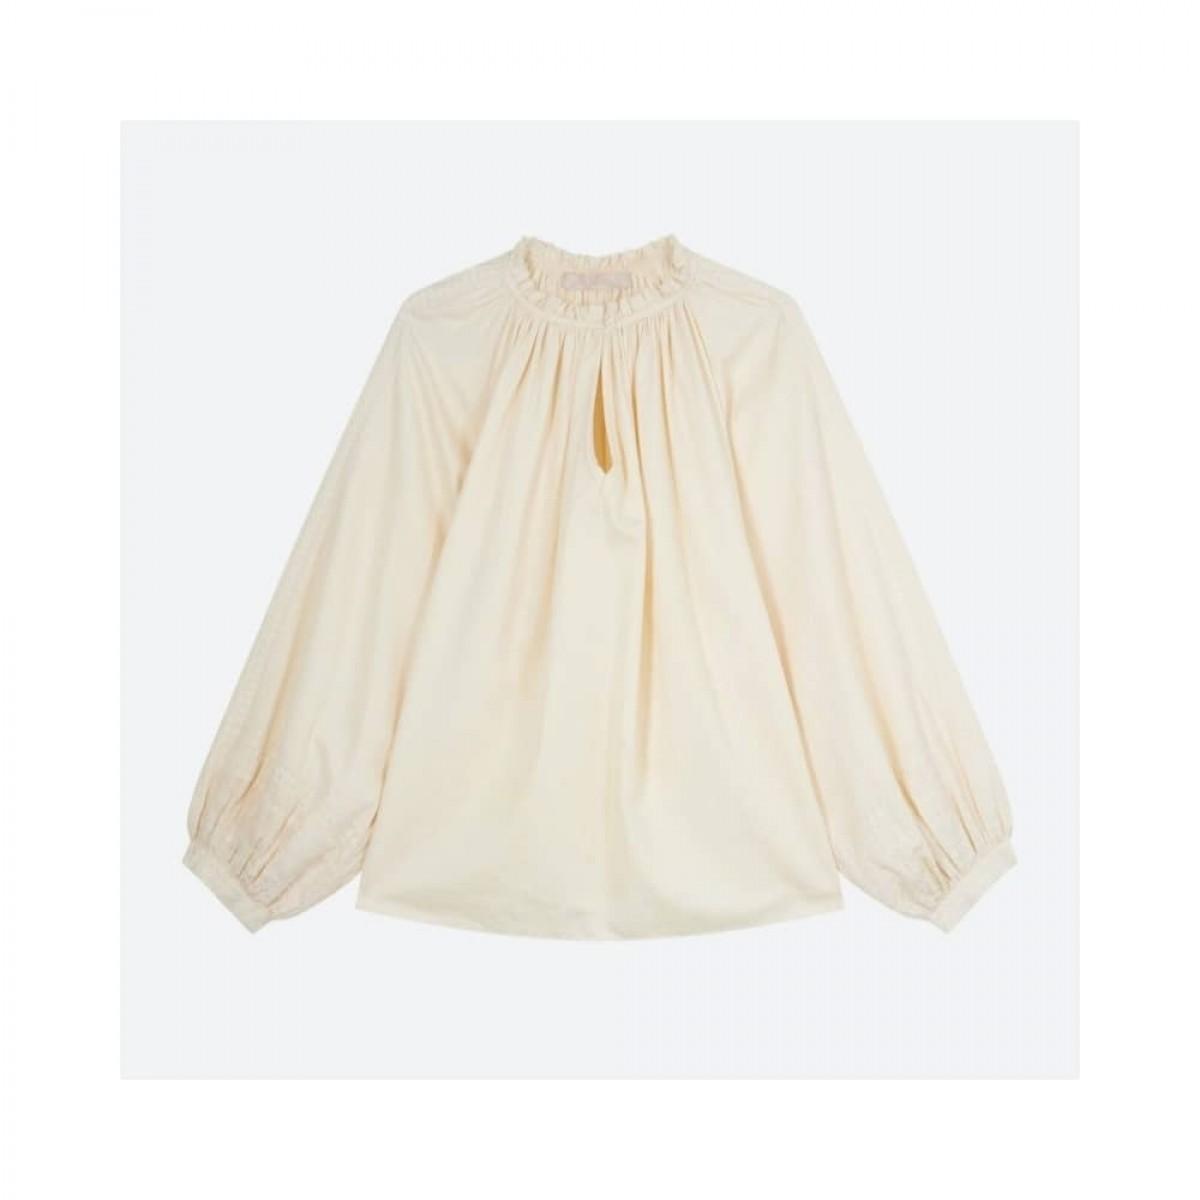 meyer bluse - ivoire - front